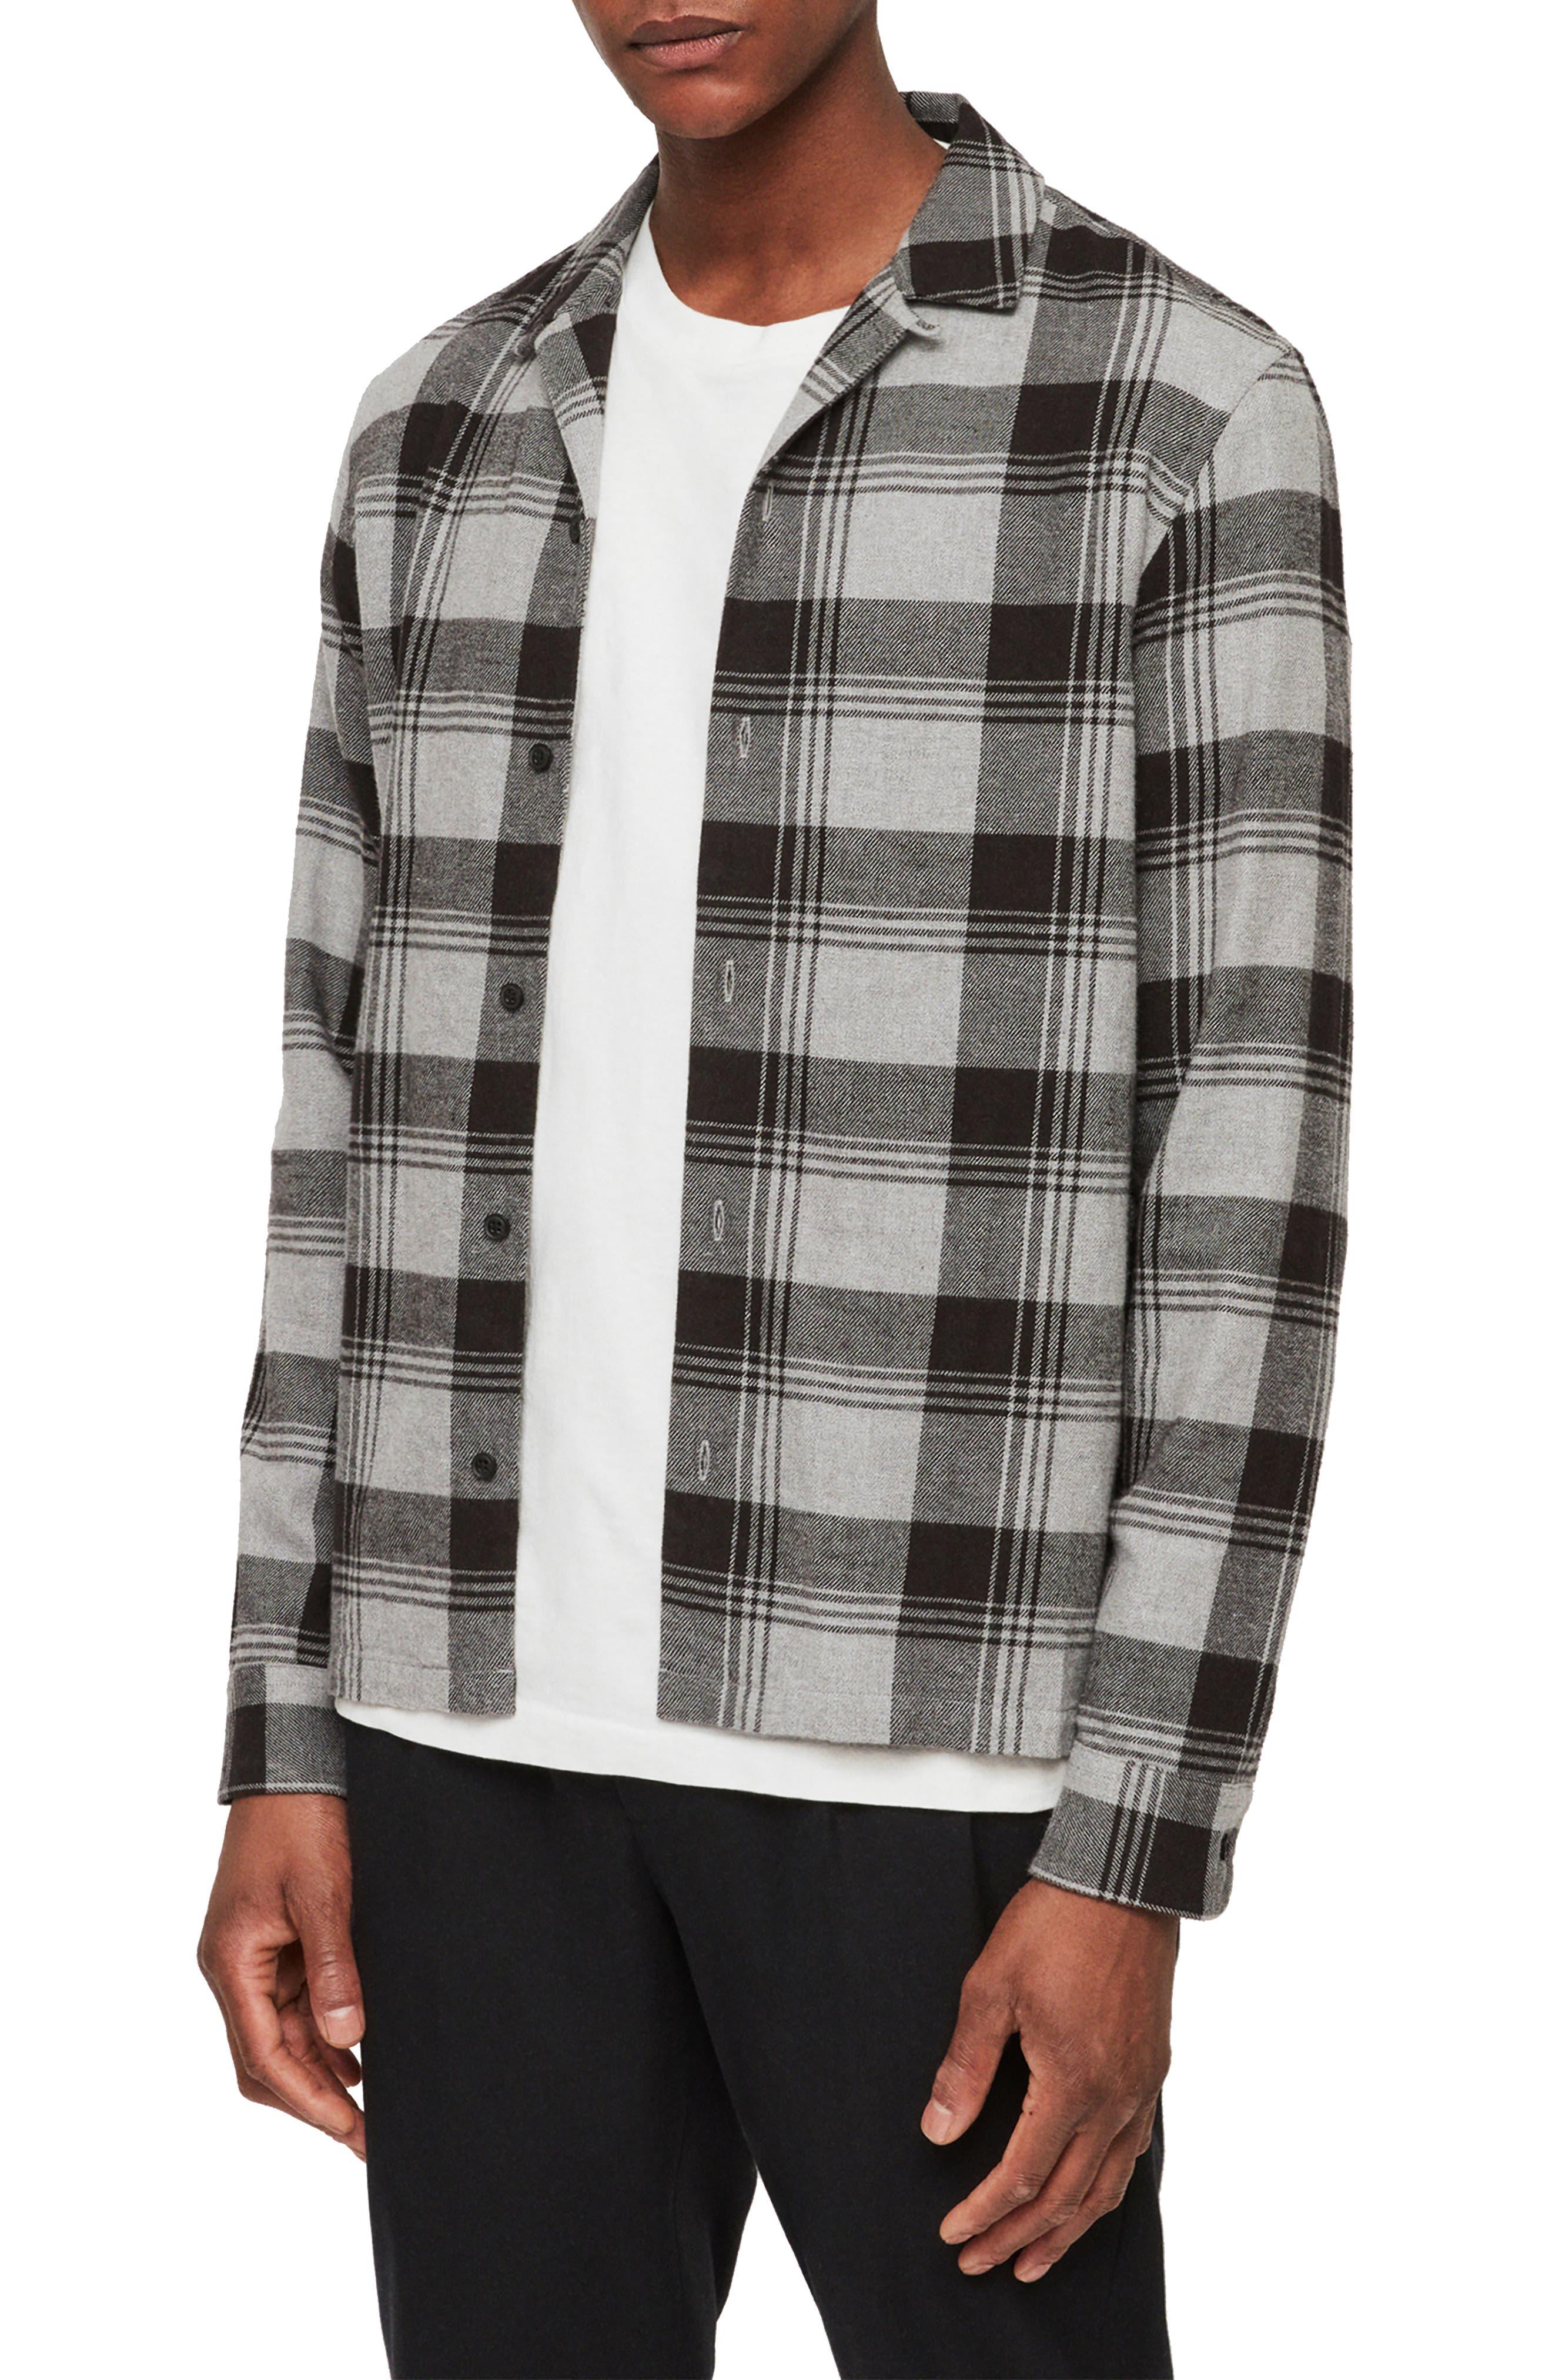 Allsaints Danby Flannel Slim Fit Shirt Jacket, Black